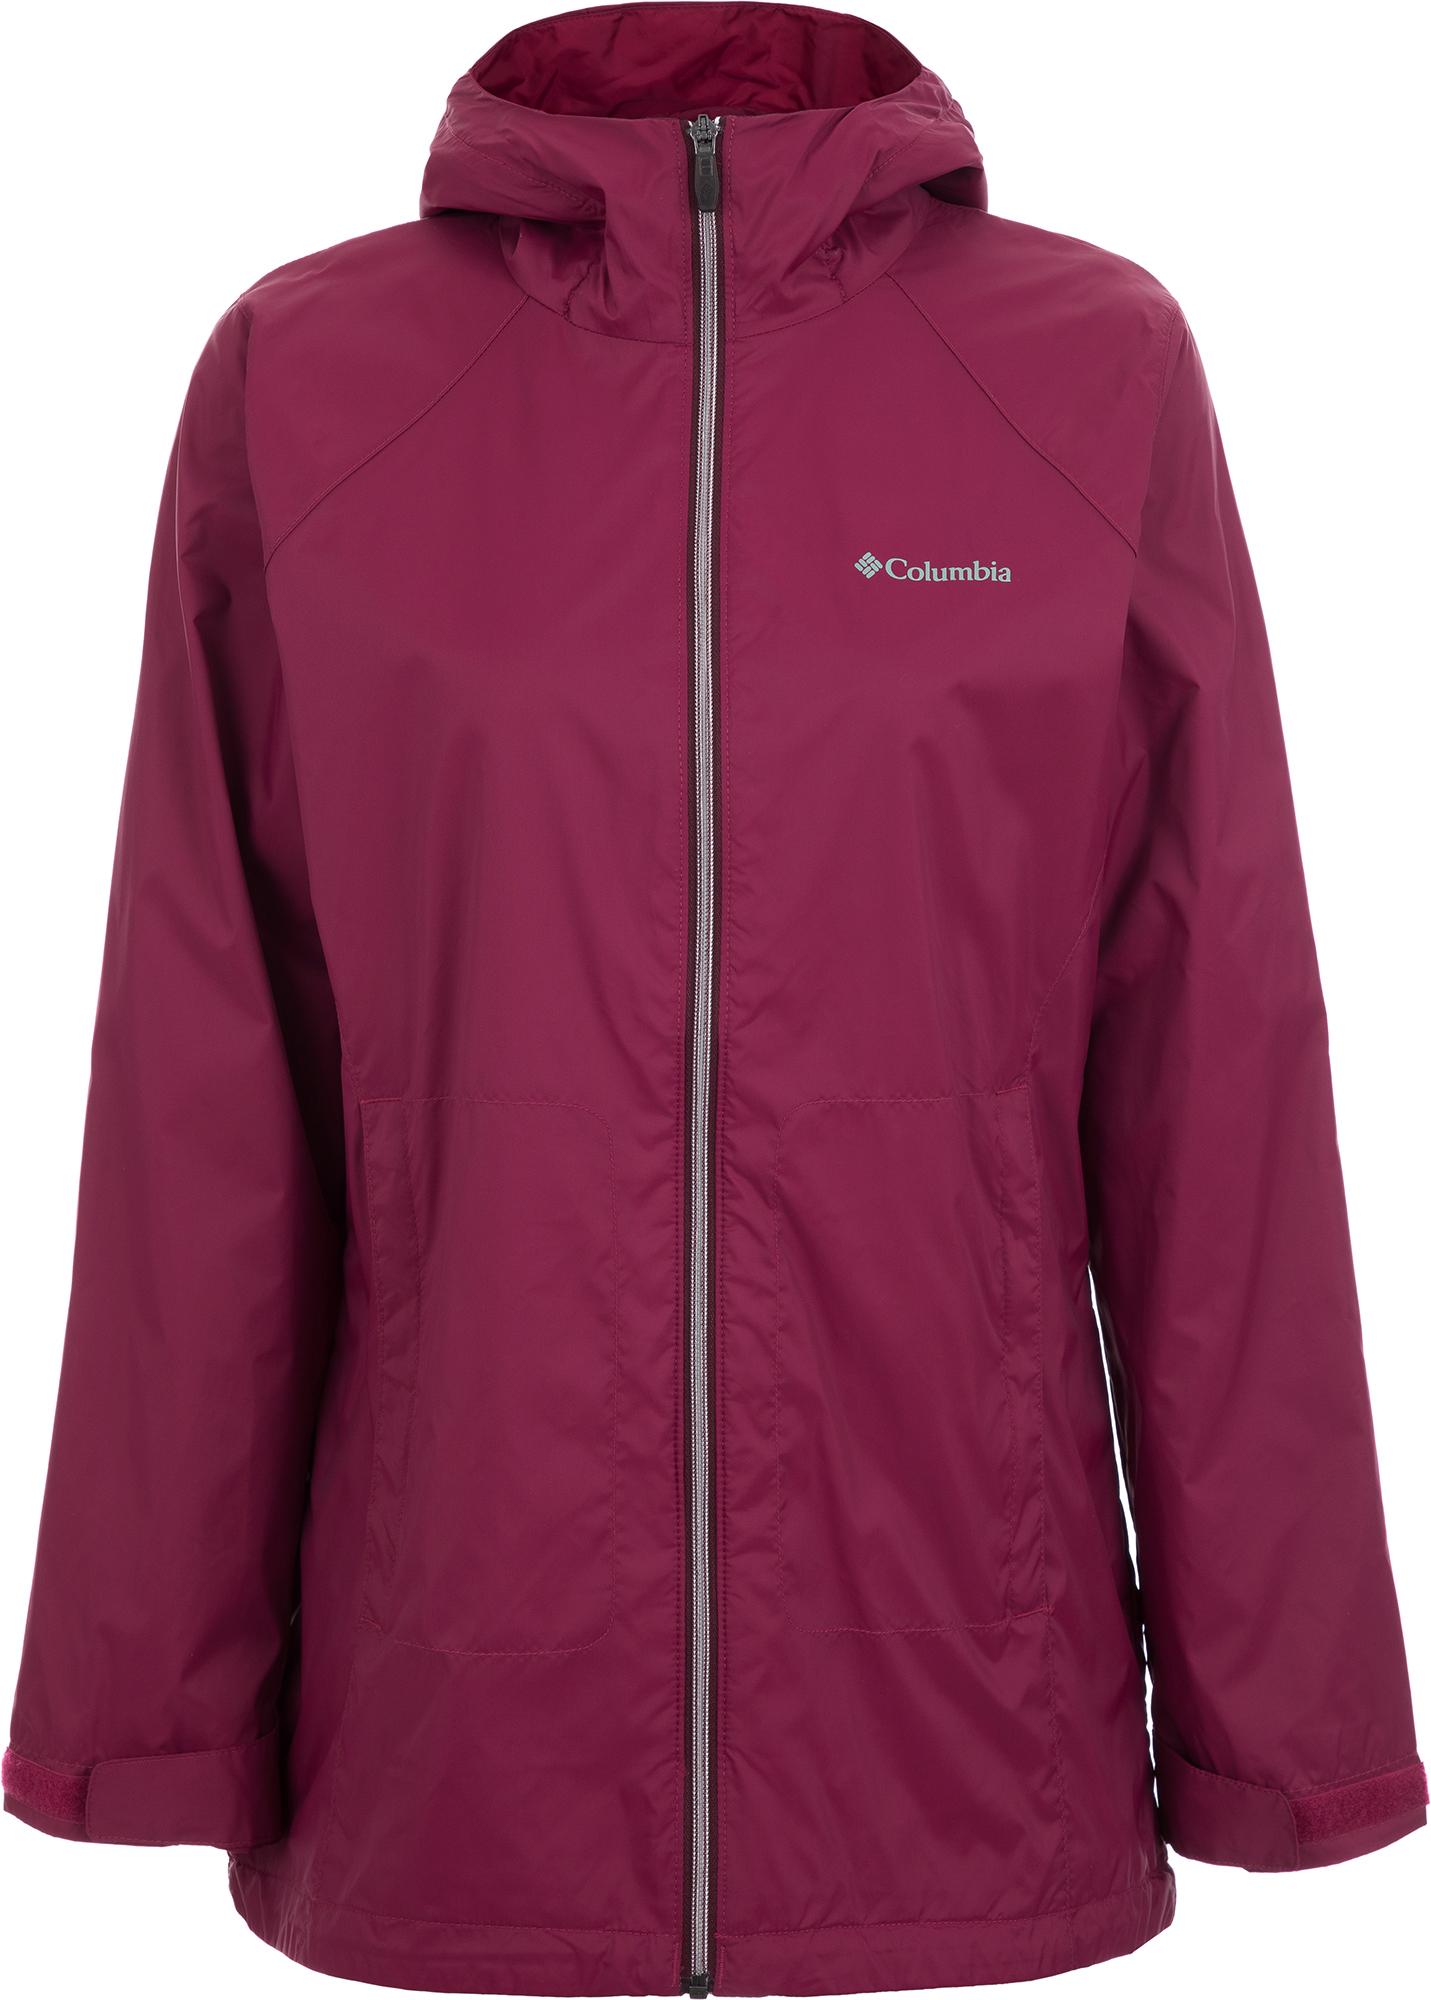 Columbia Куртка утепленная женская Columbia Switchback Lined, размер 42 цена и фото